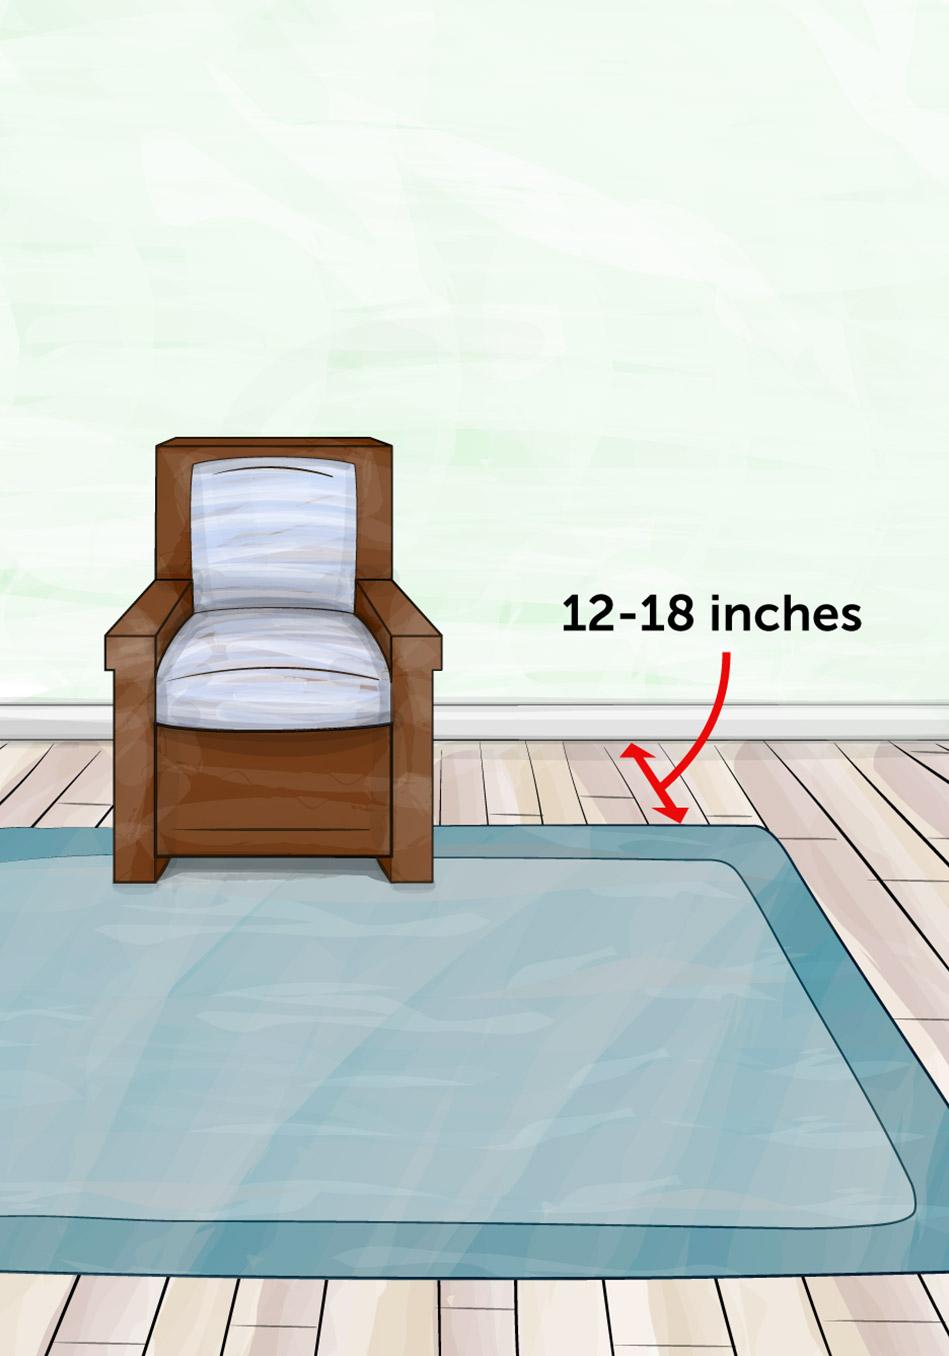 Property Brothers Interior Design Rules of Thumb, via Oprah.com